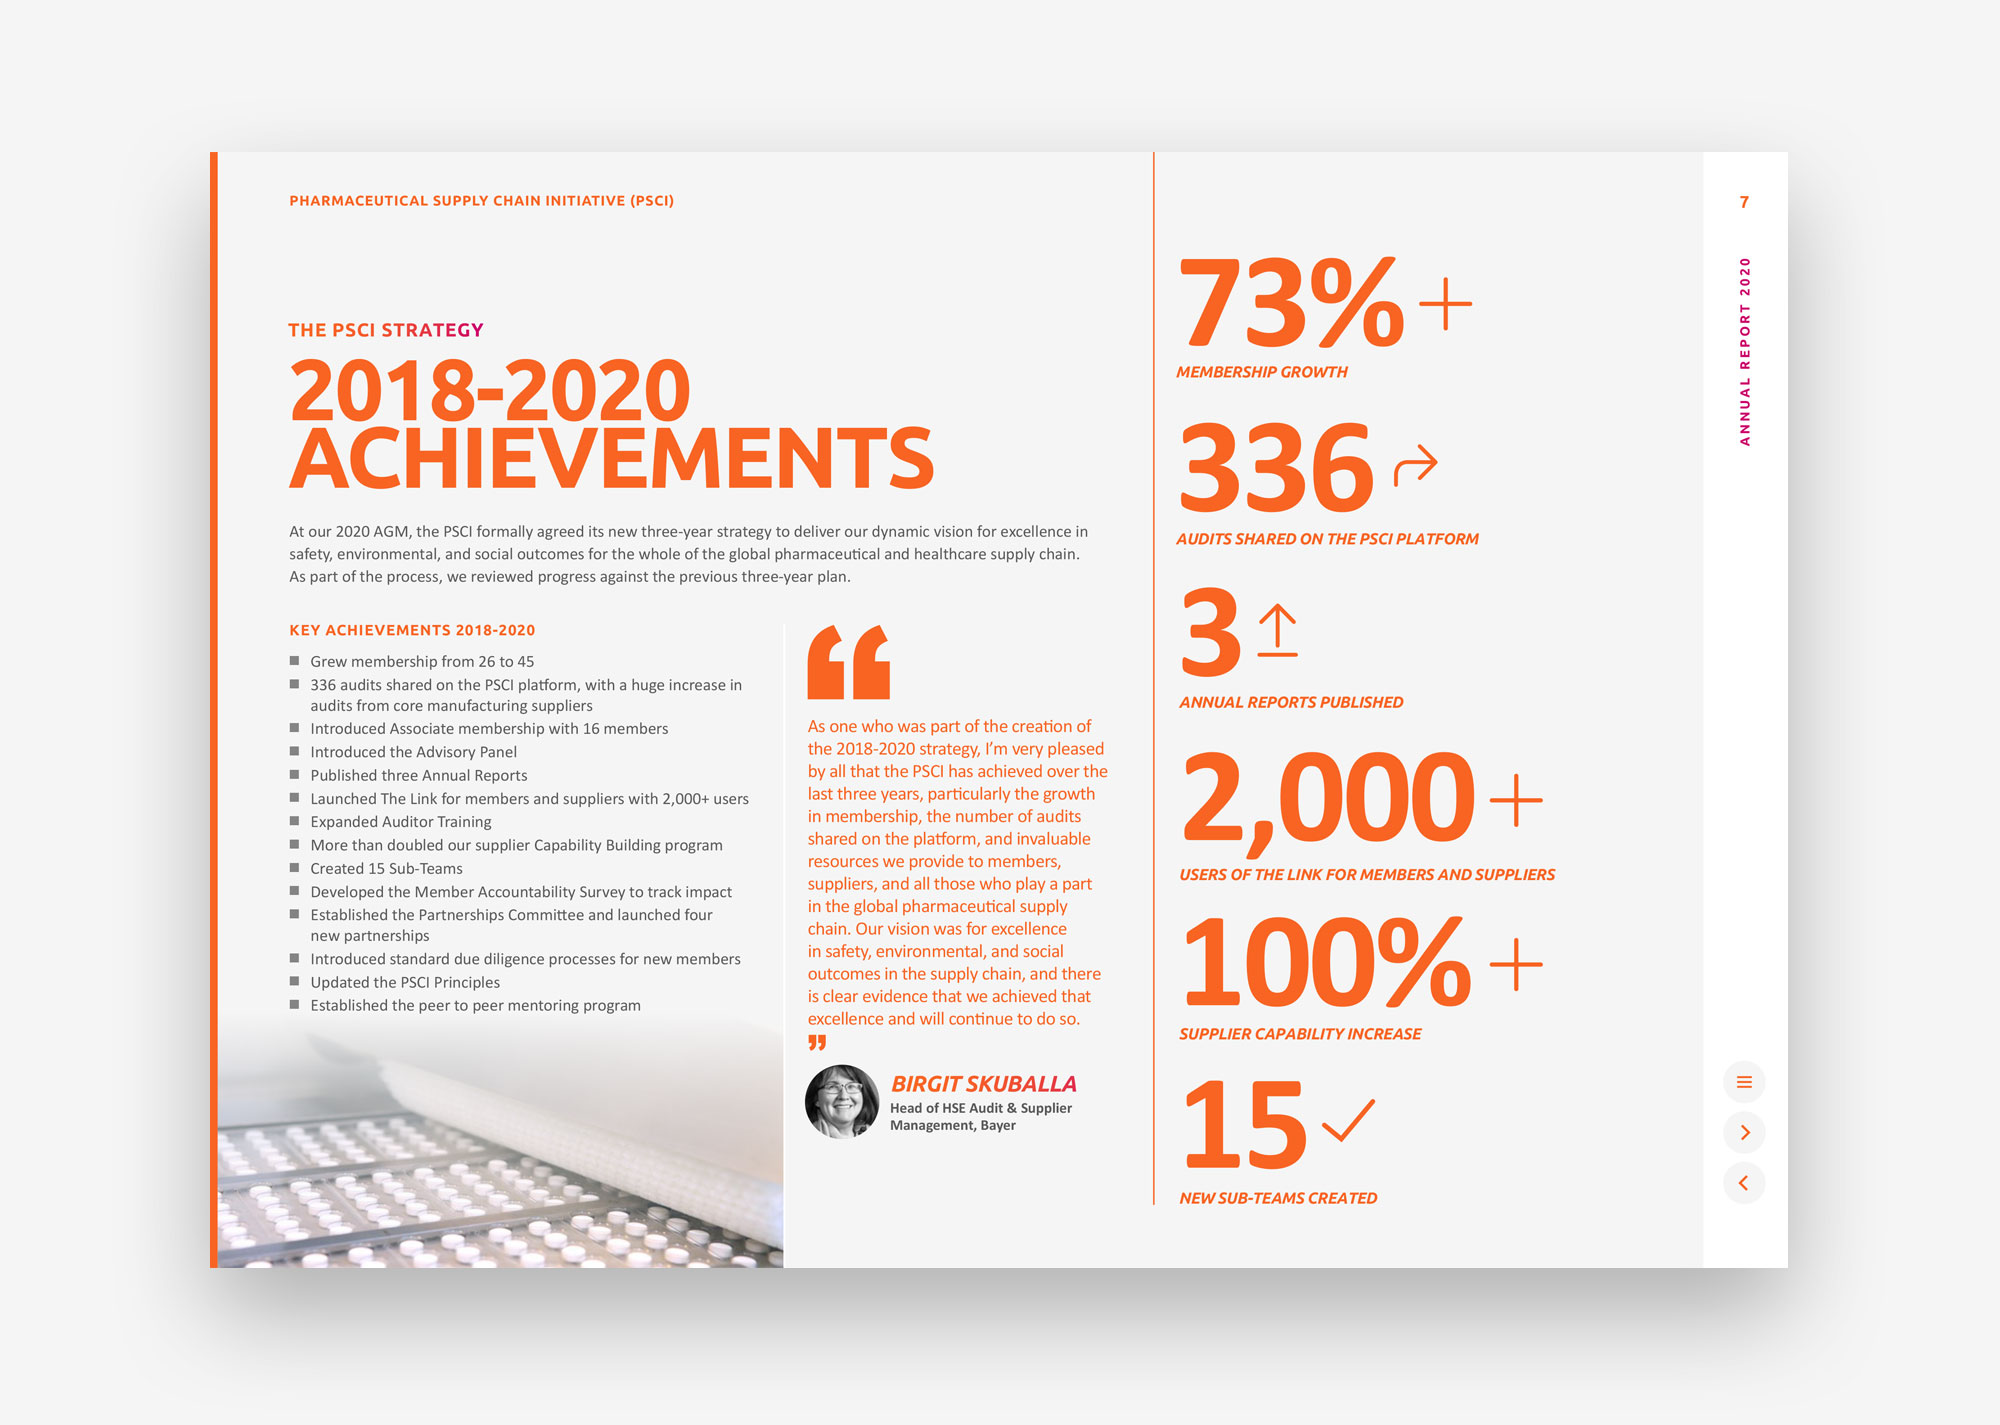 PSCI Annual Report 2020 achievemenets